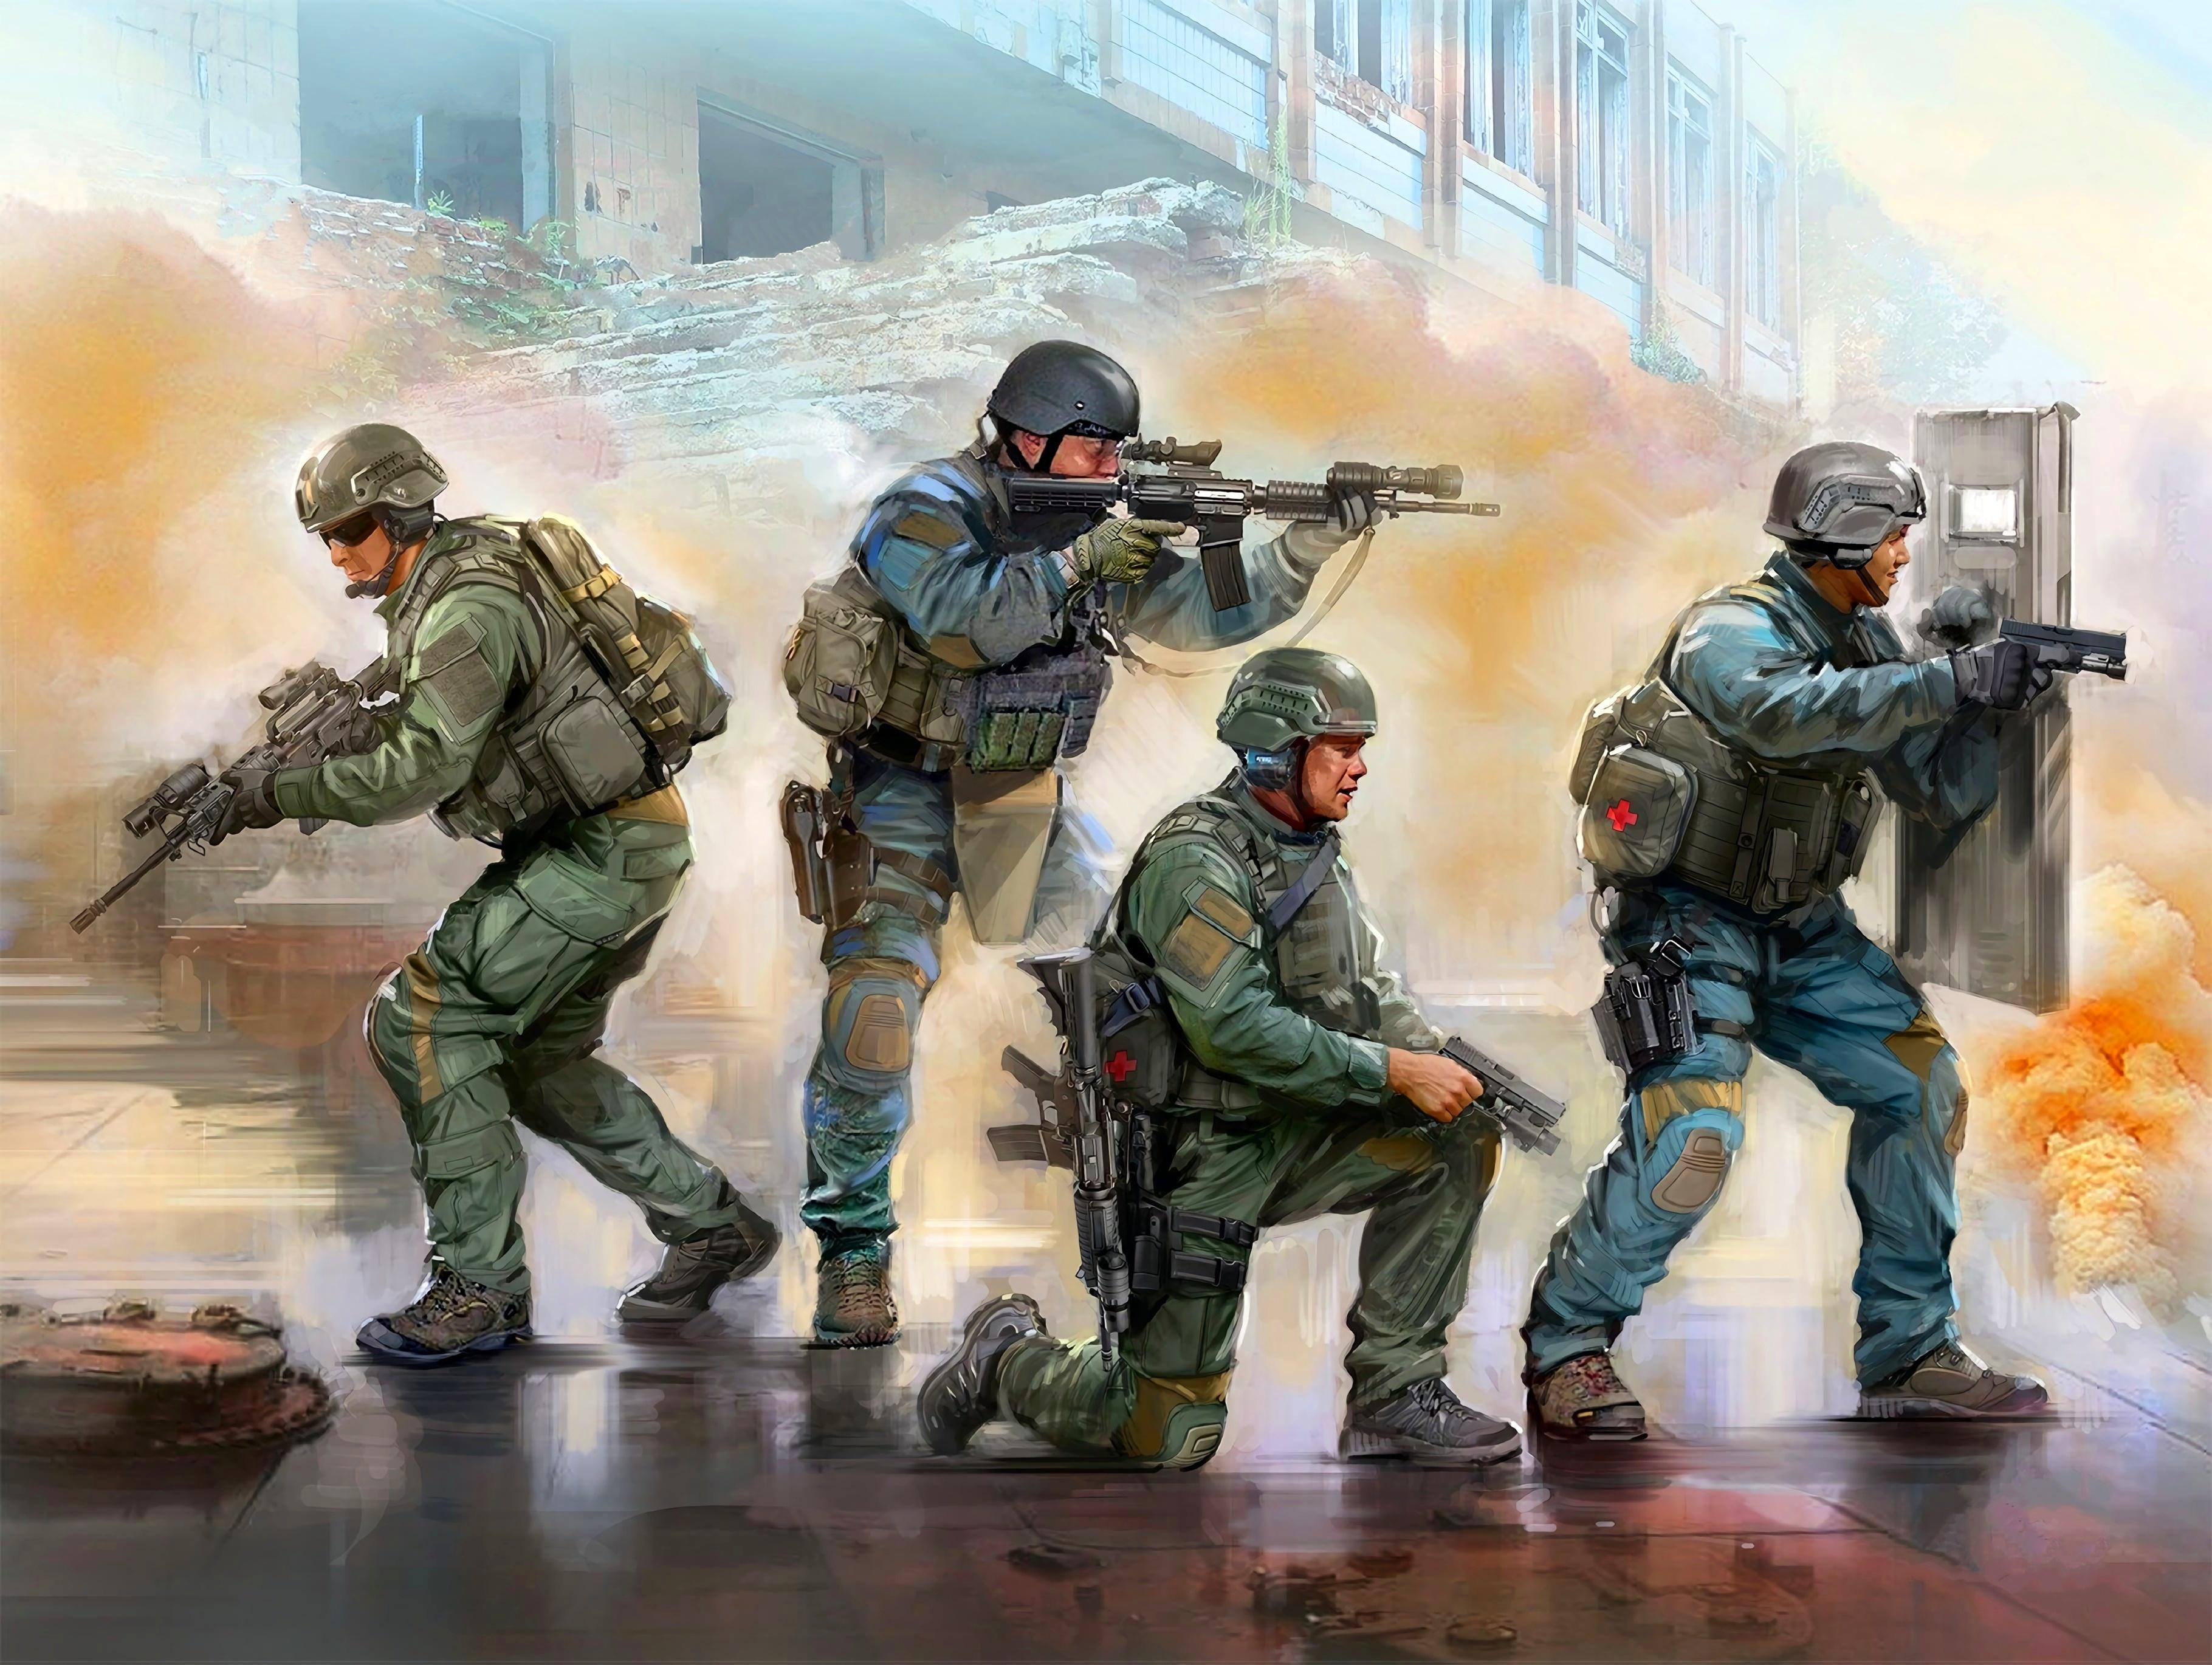 Wallpaper Swat Men Artwork Weapon Usa Police Special